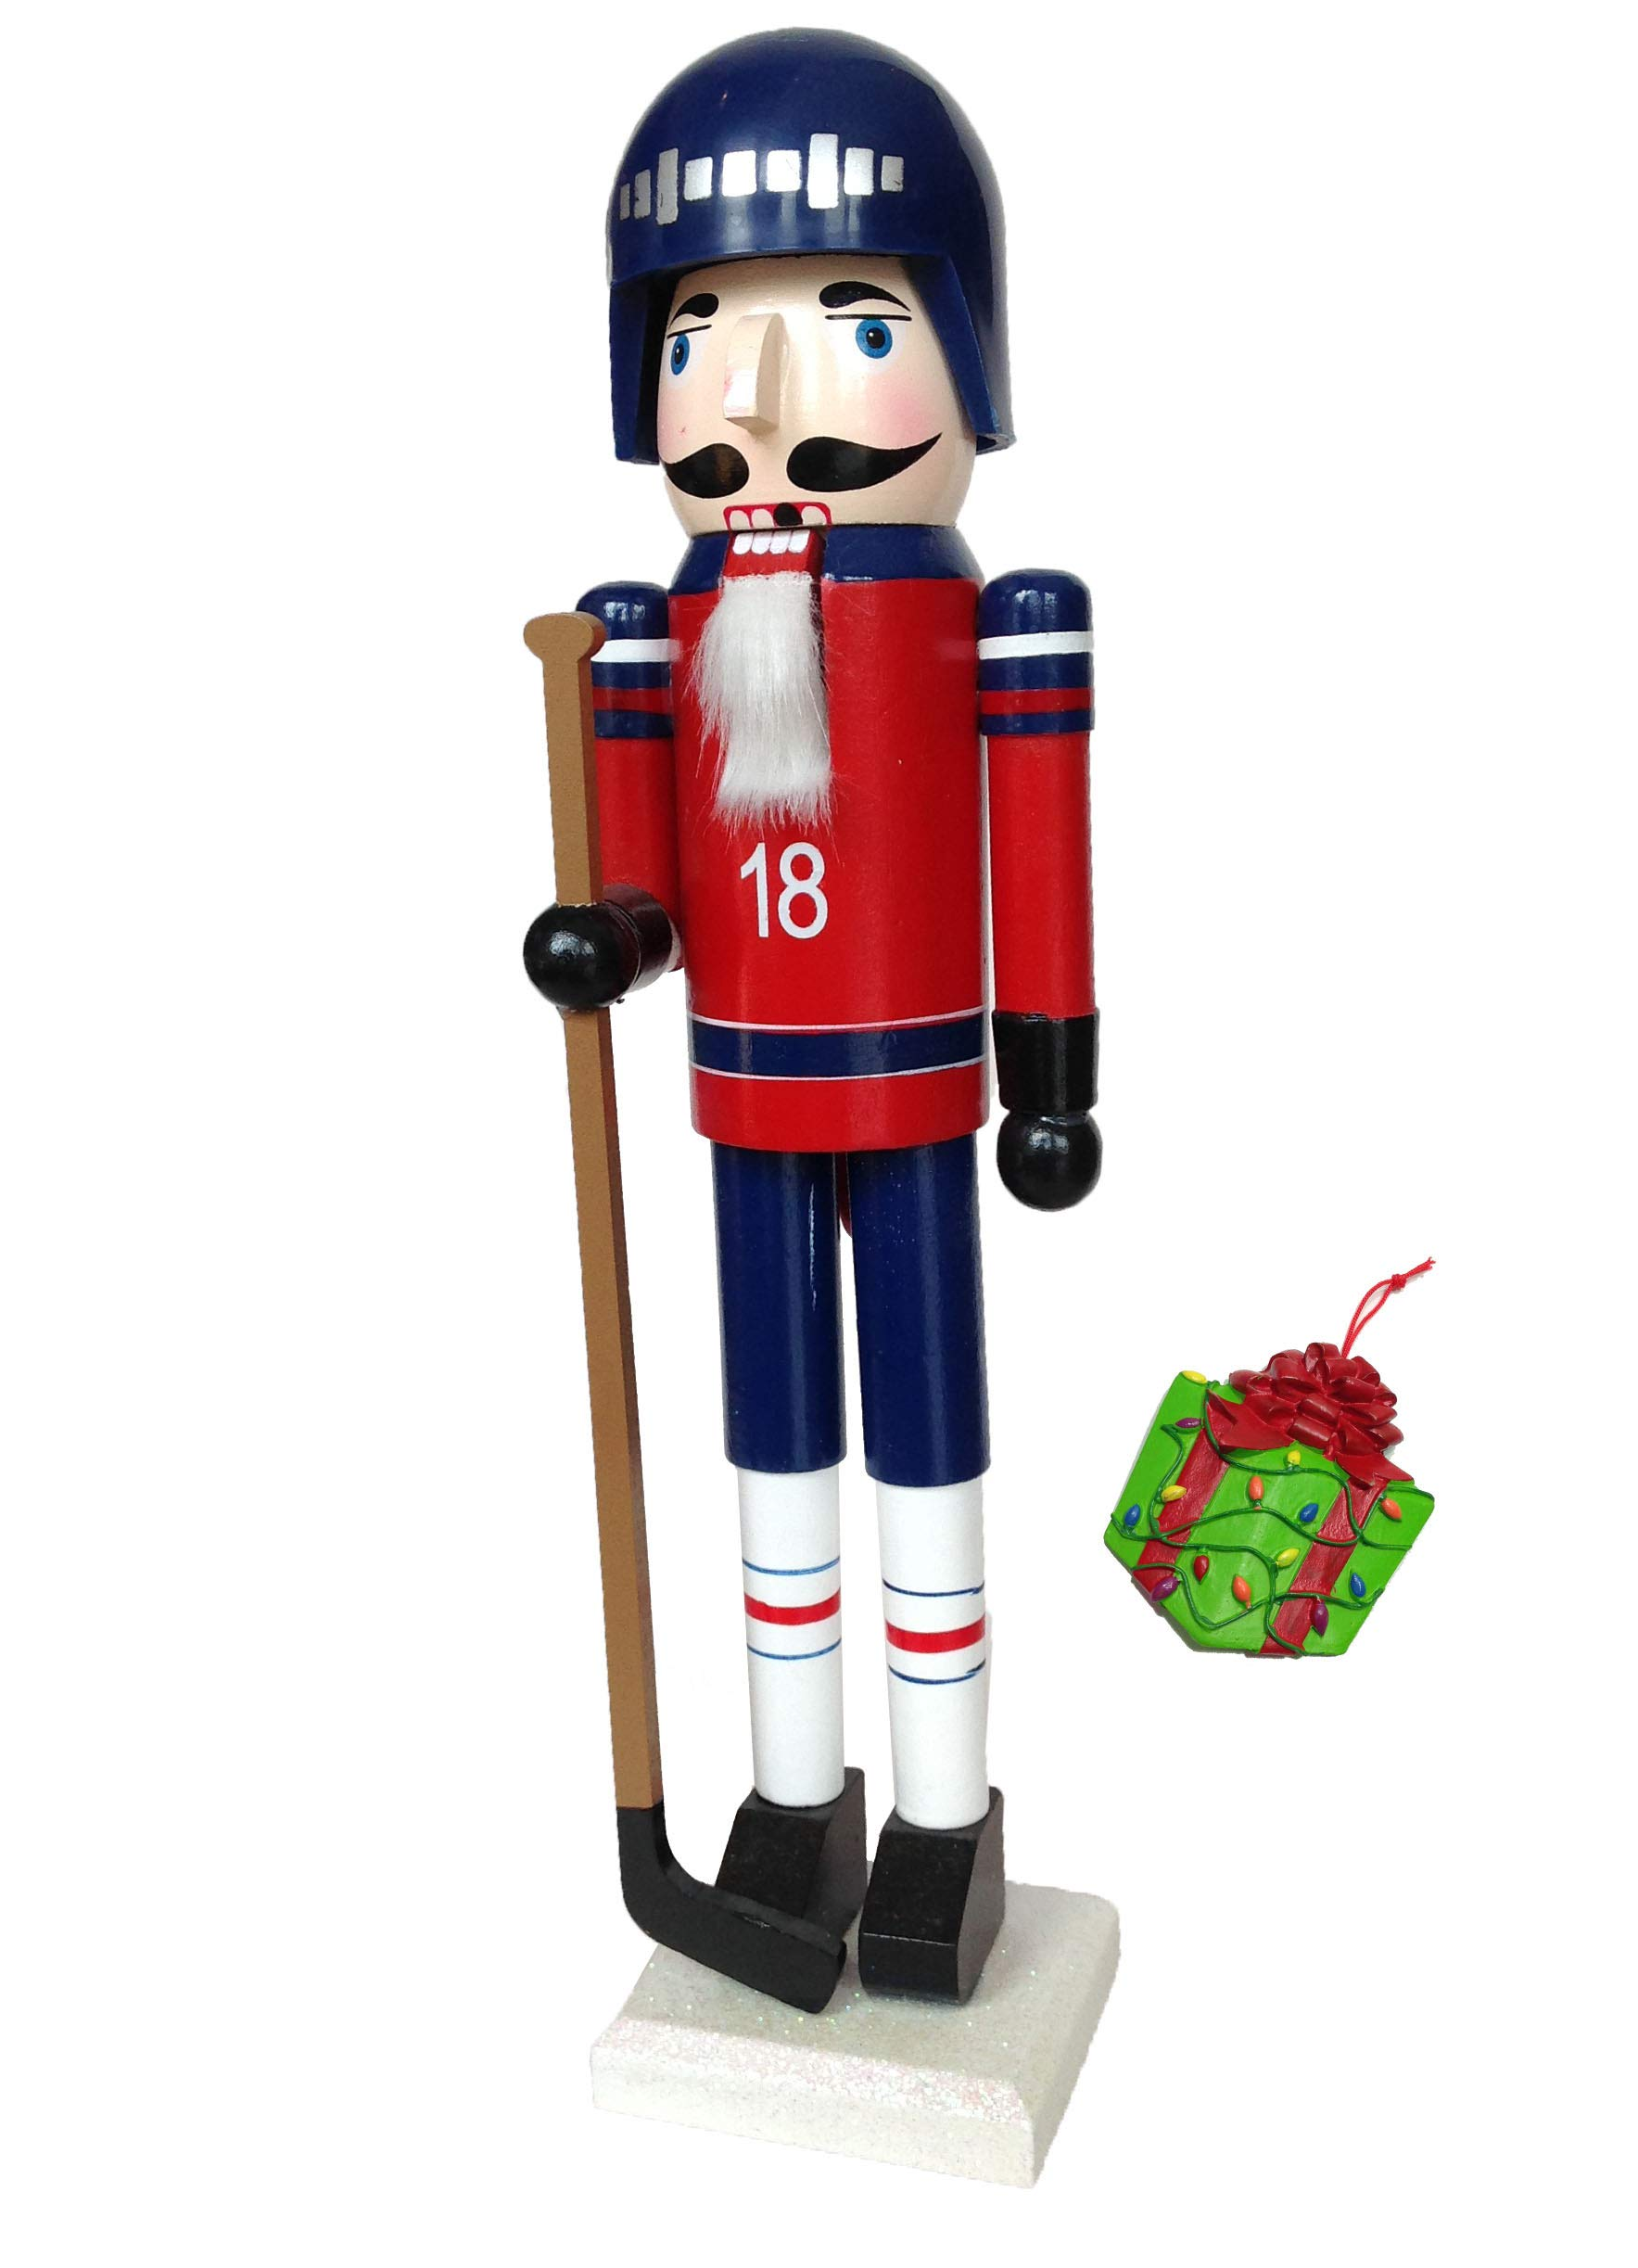 Hockey Player Sports Large Unique Decorative Holiday Season Wooden Christmas Nutcracker & Bonus Tree Ornament